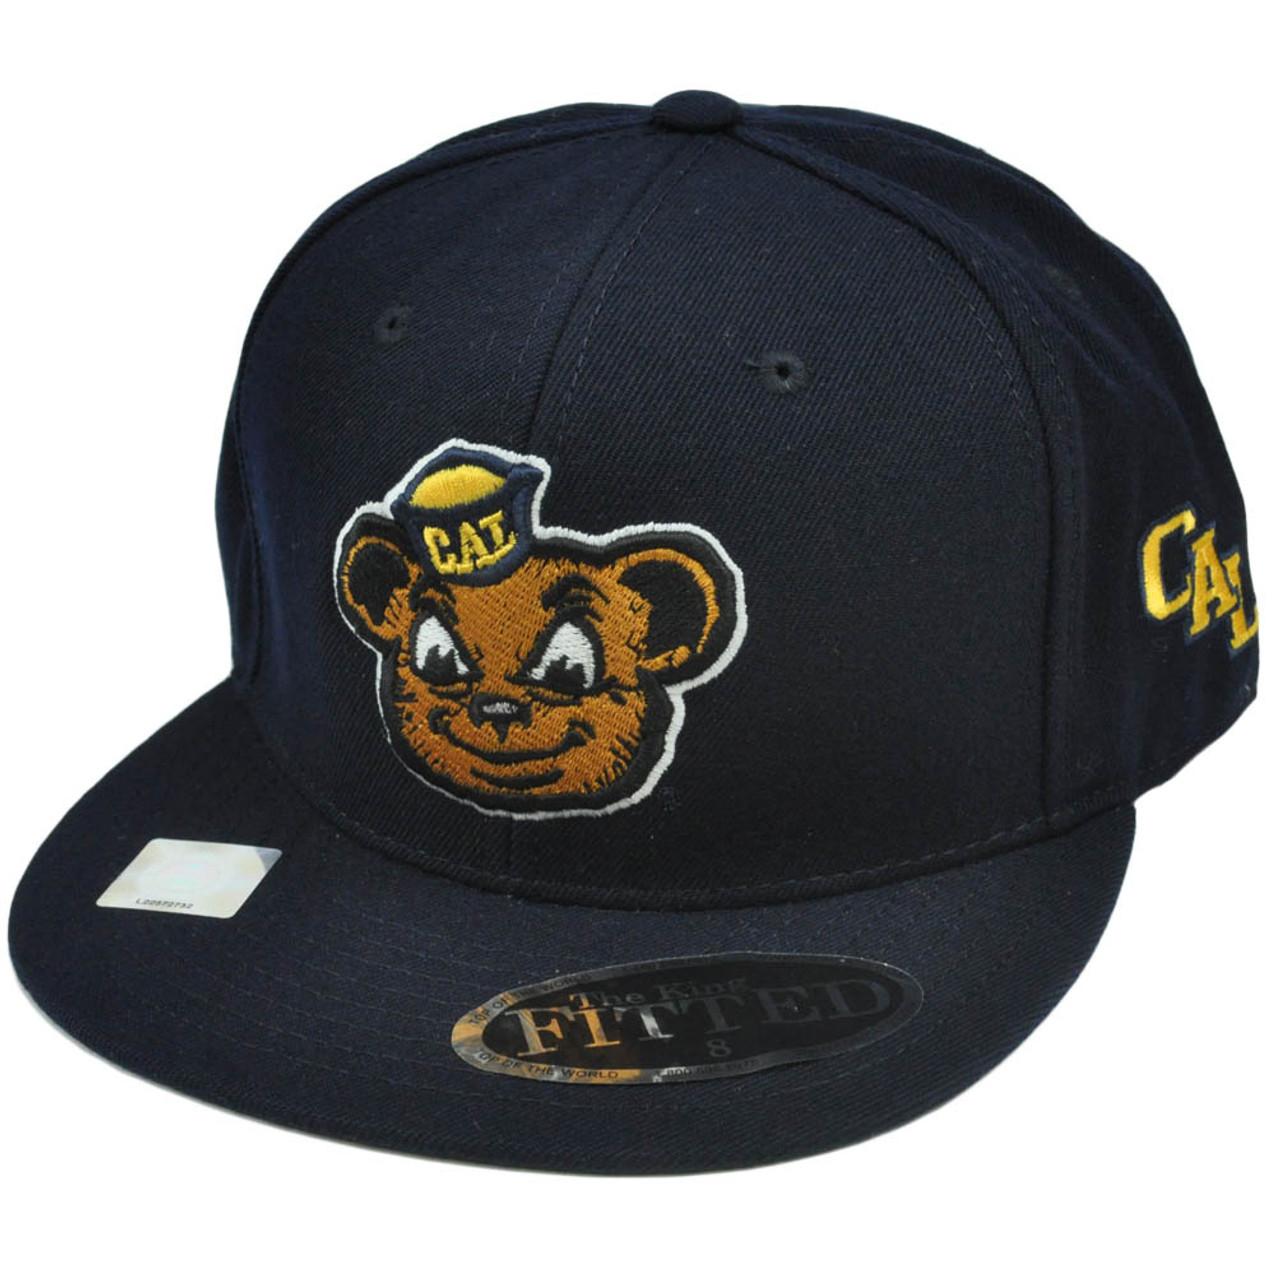 d5de9097c1 NCAA California Golden Bears Top of World Licensed Hat Cap Flat Bill Fitted  8